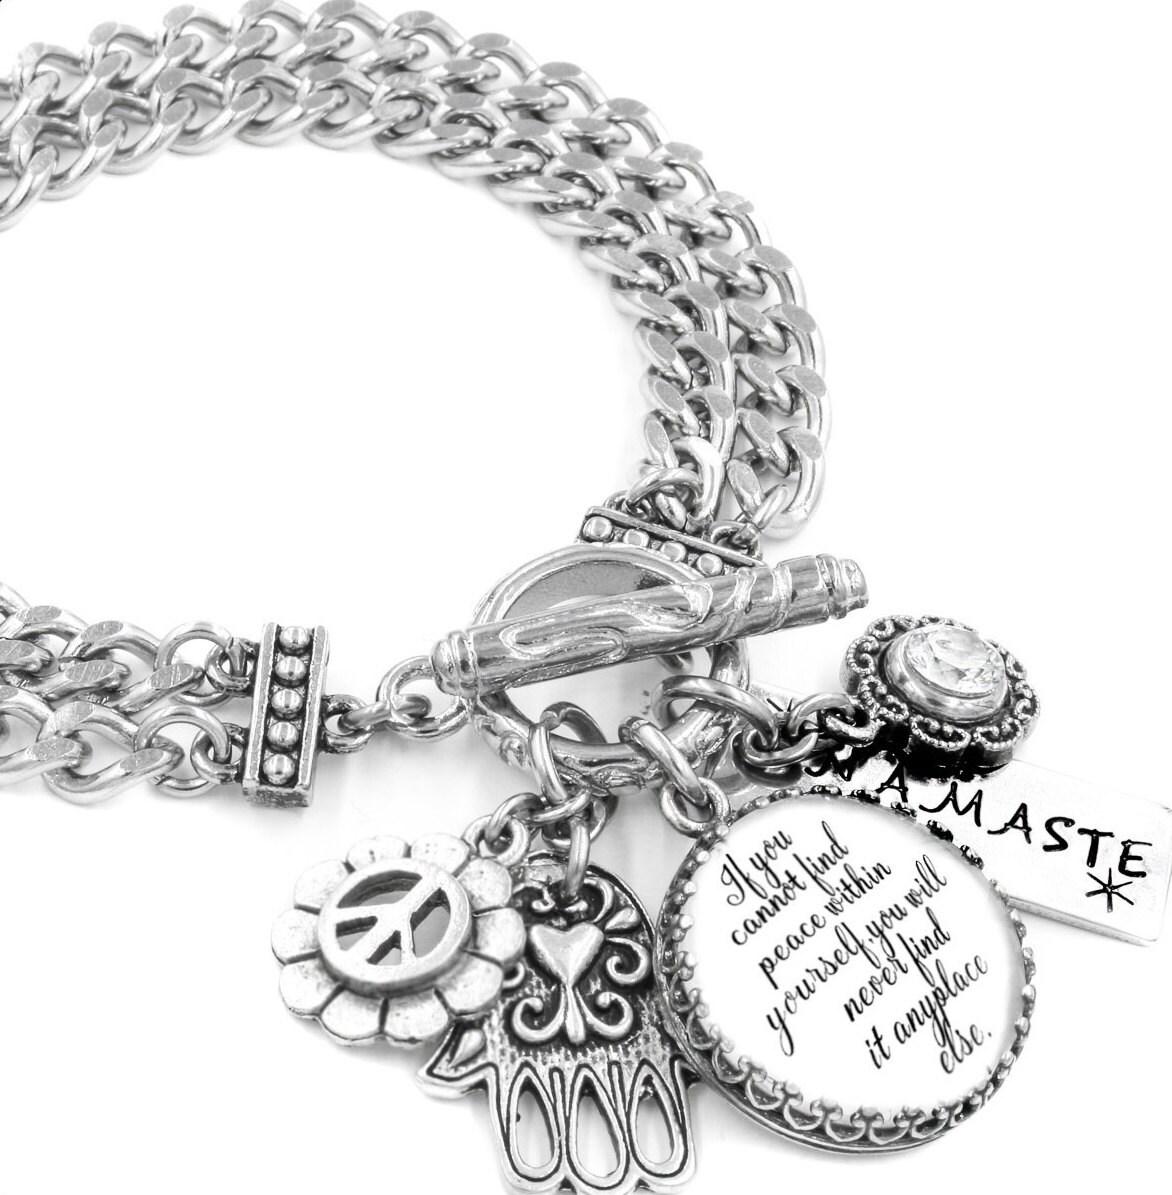 Inspirational Bracelet Silver Inspirational Quote Jewelry